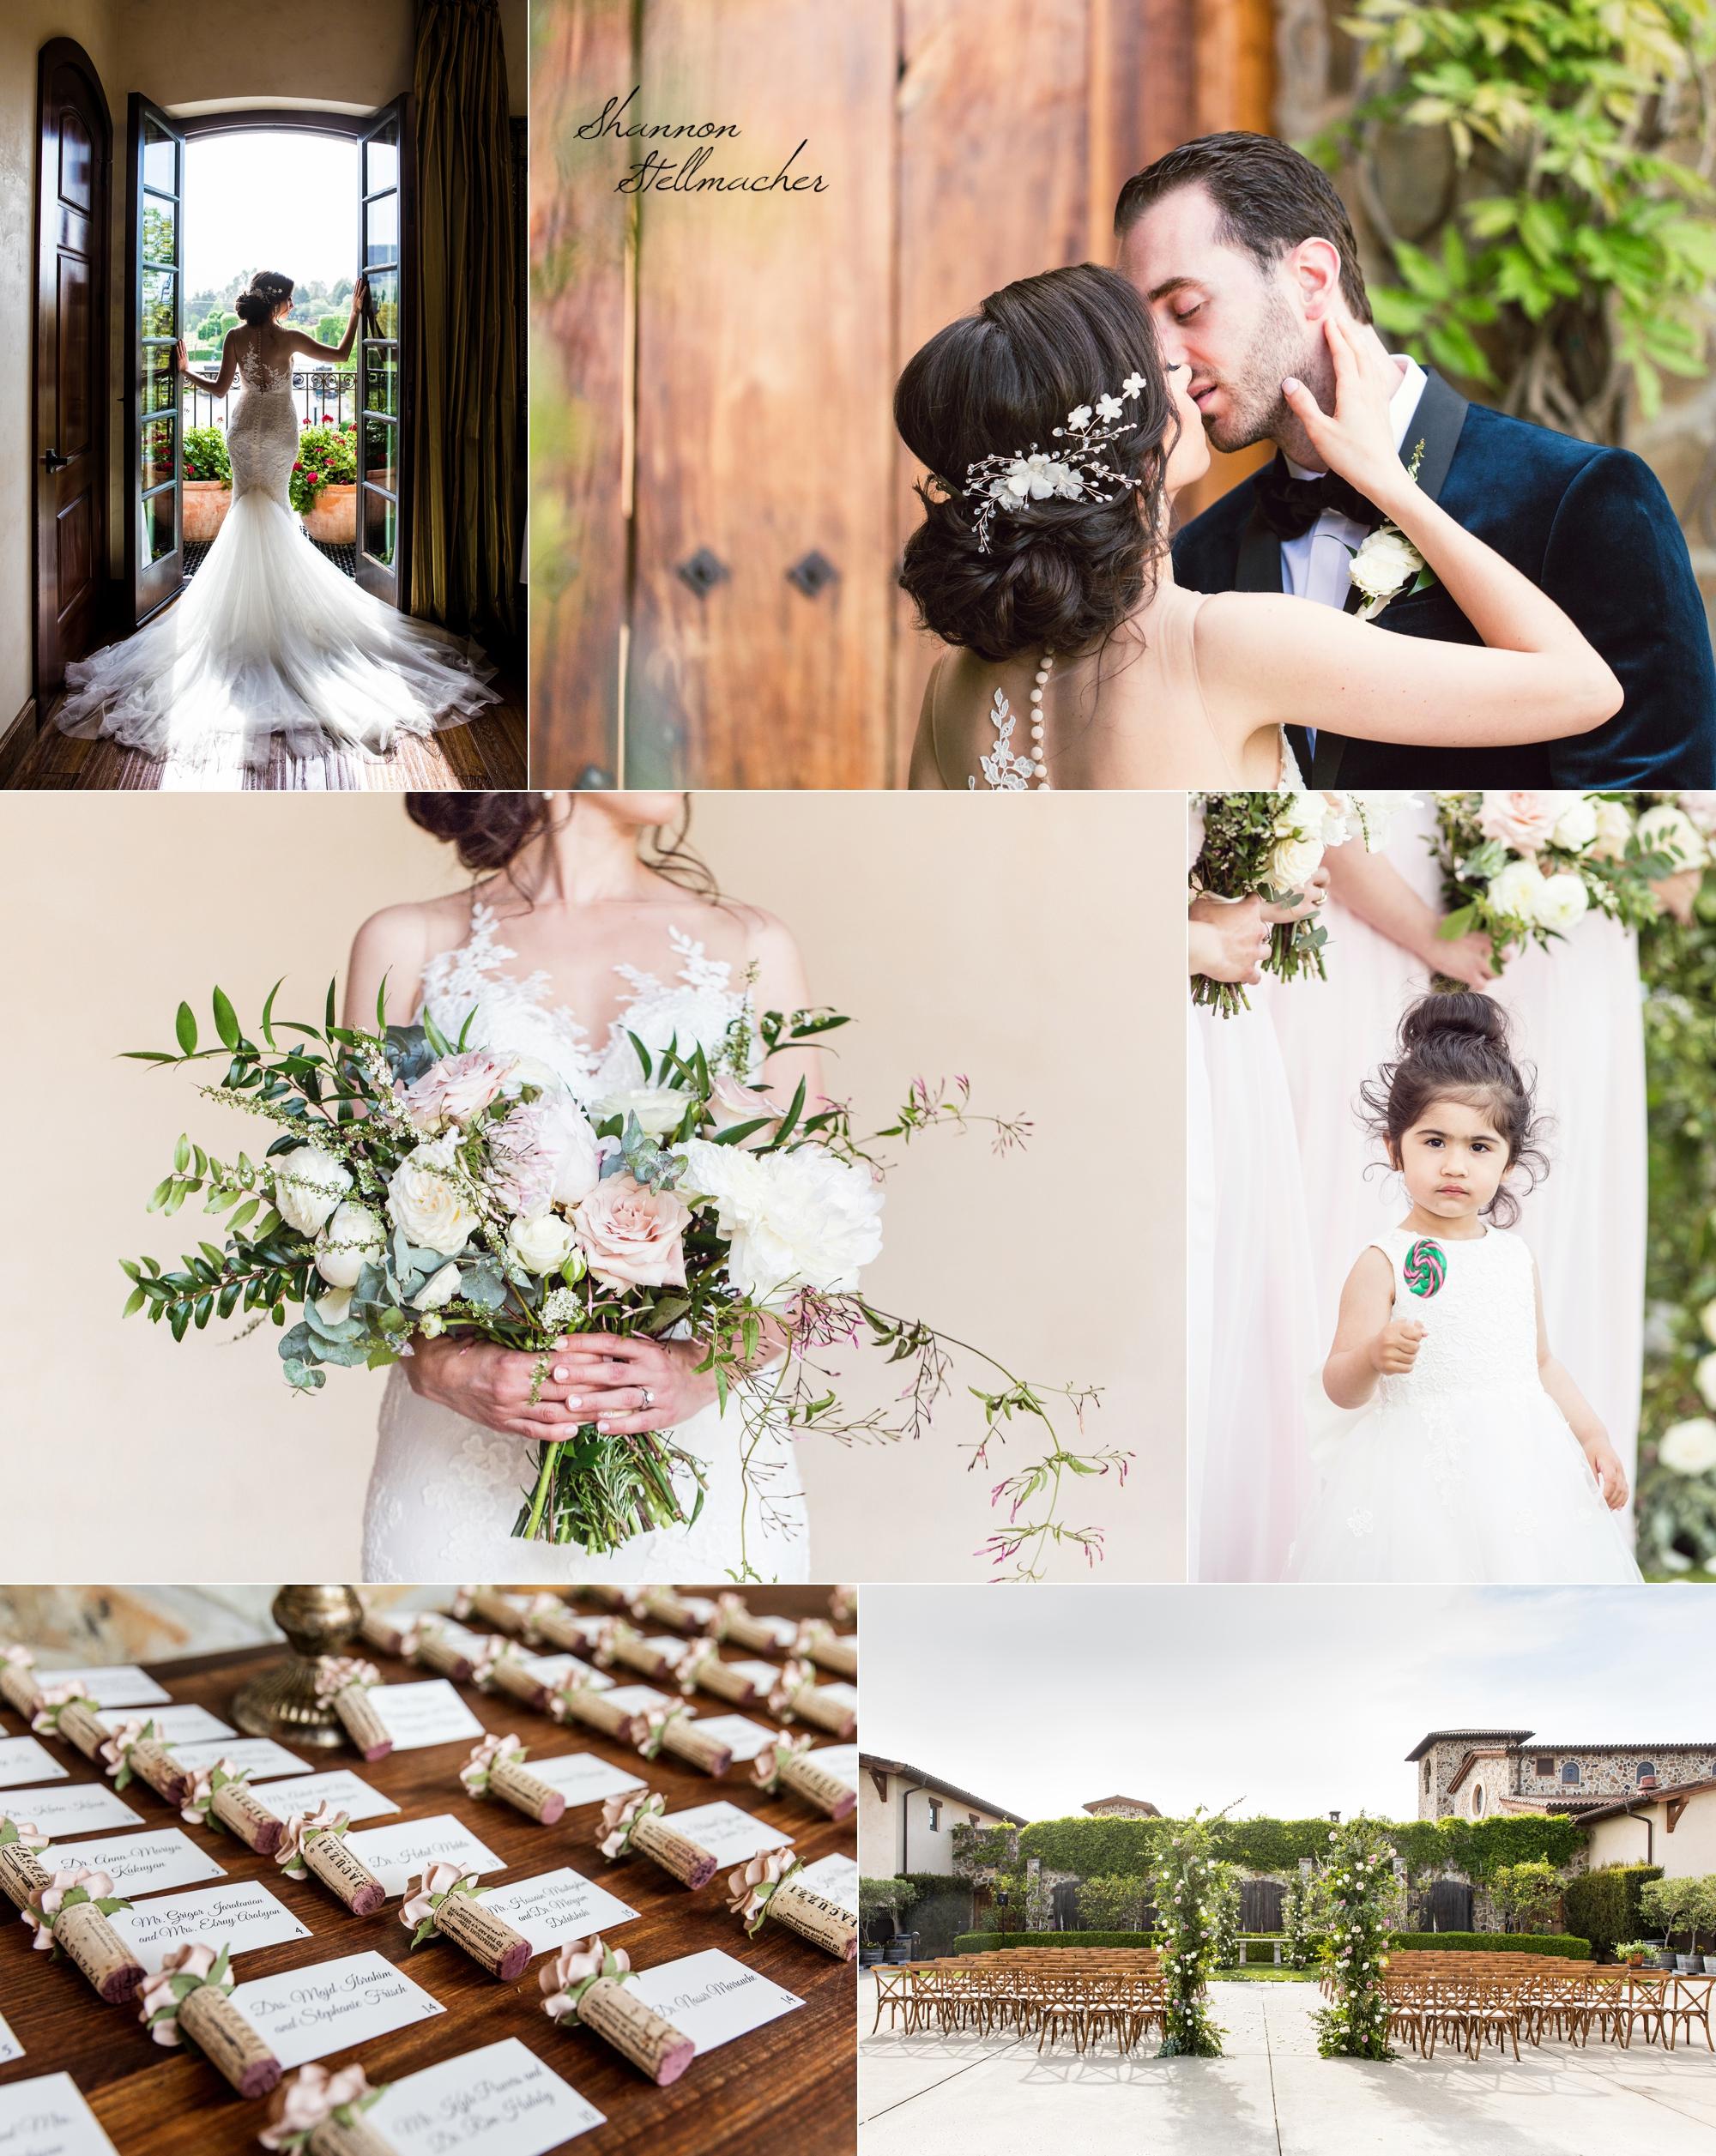 Jacuzzi Winery Sonoma Wedding 1.jpg